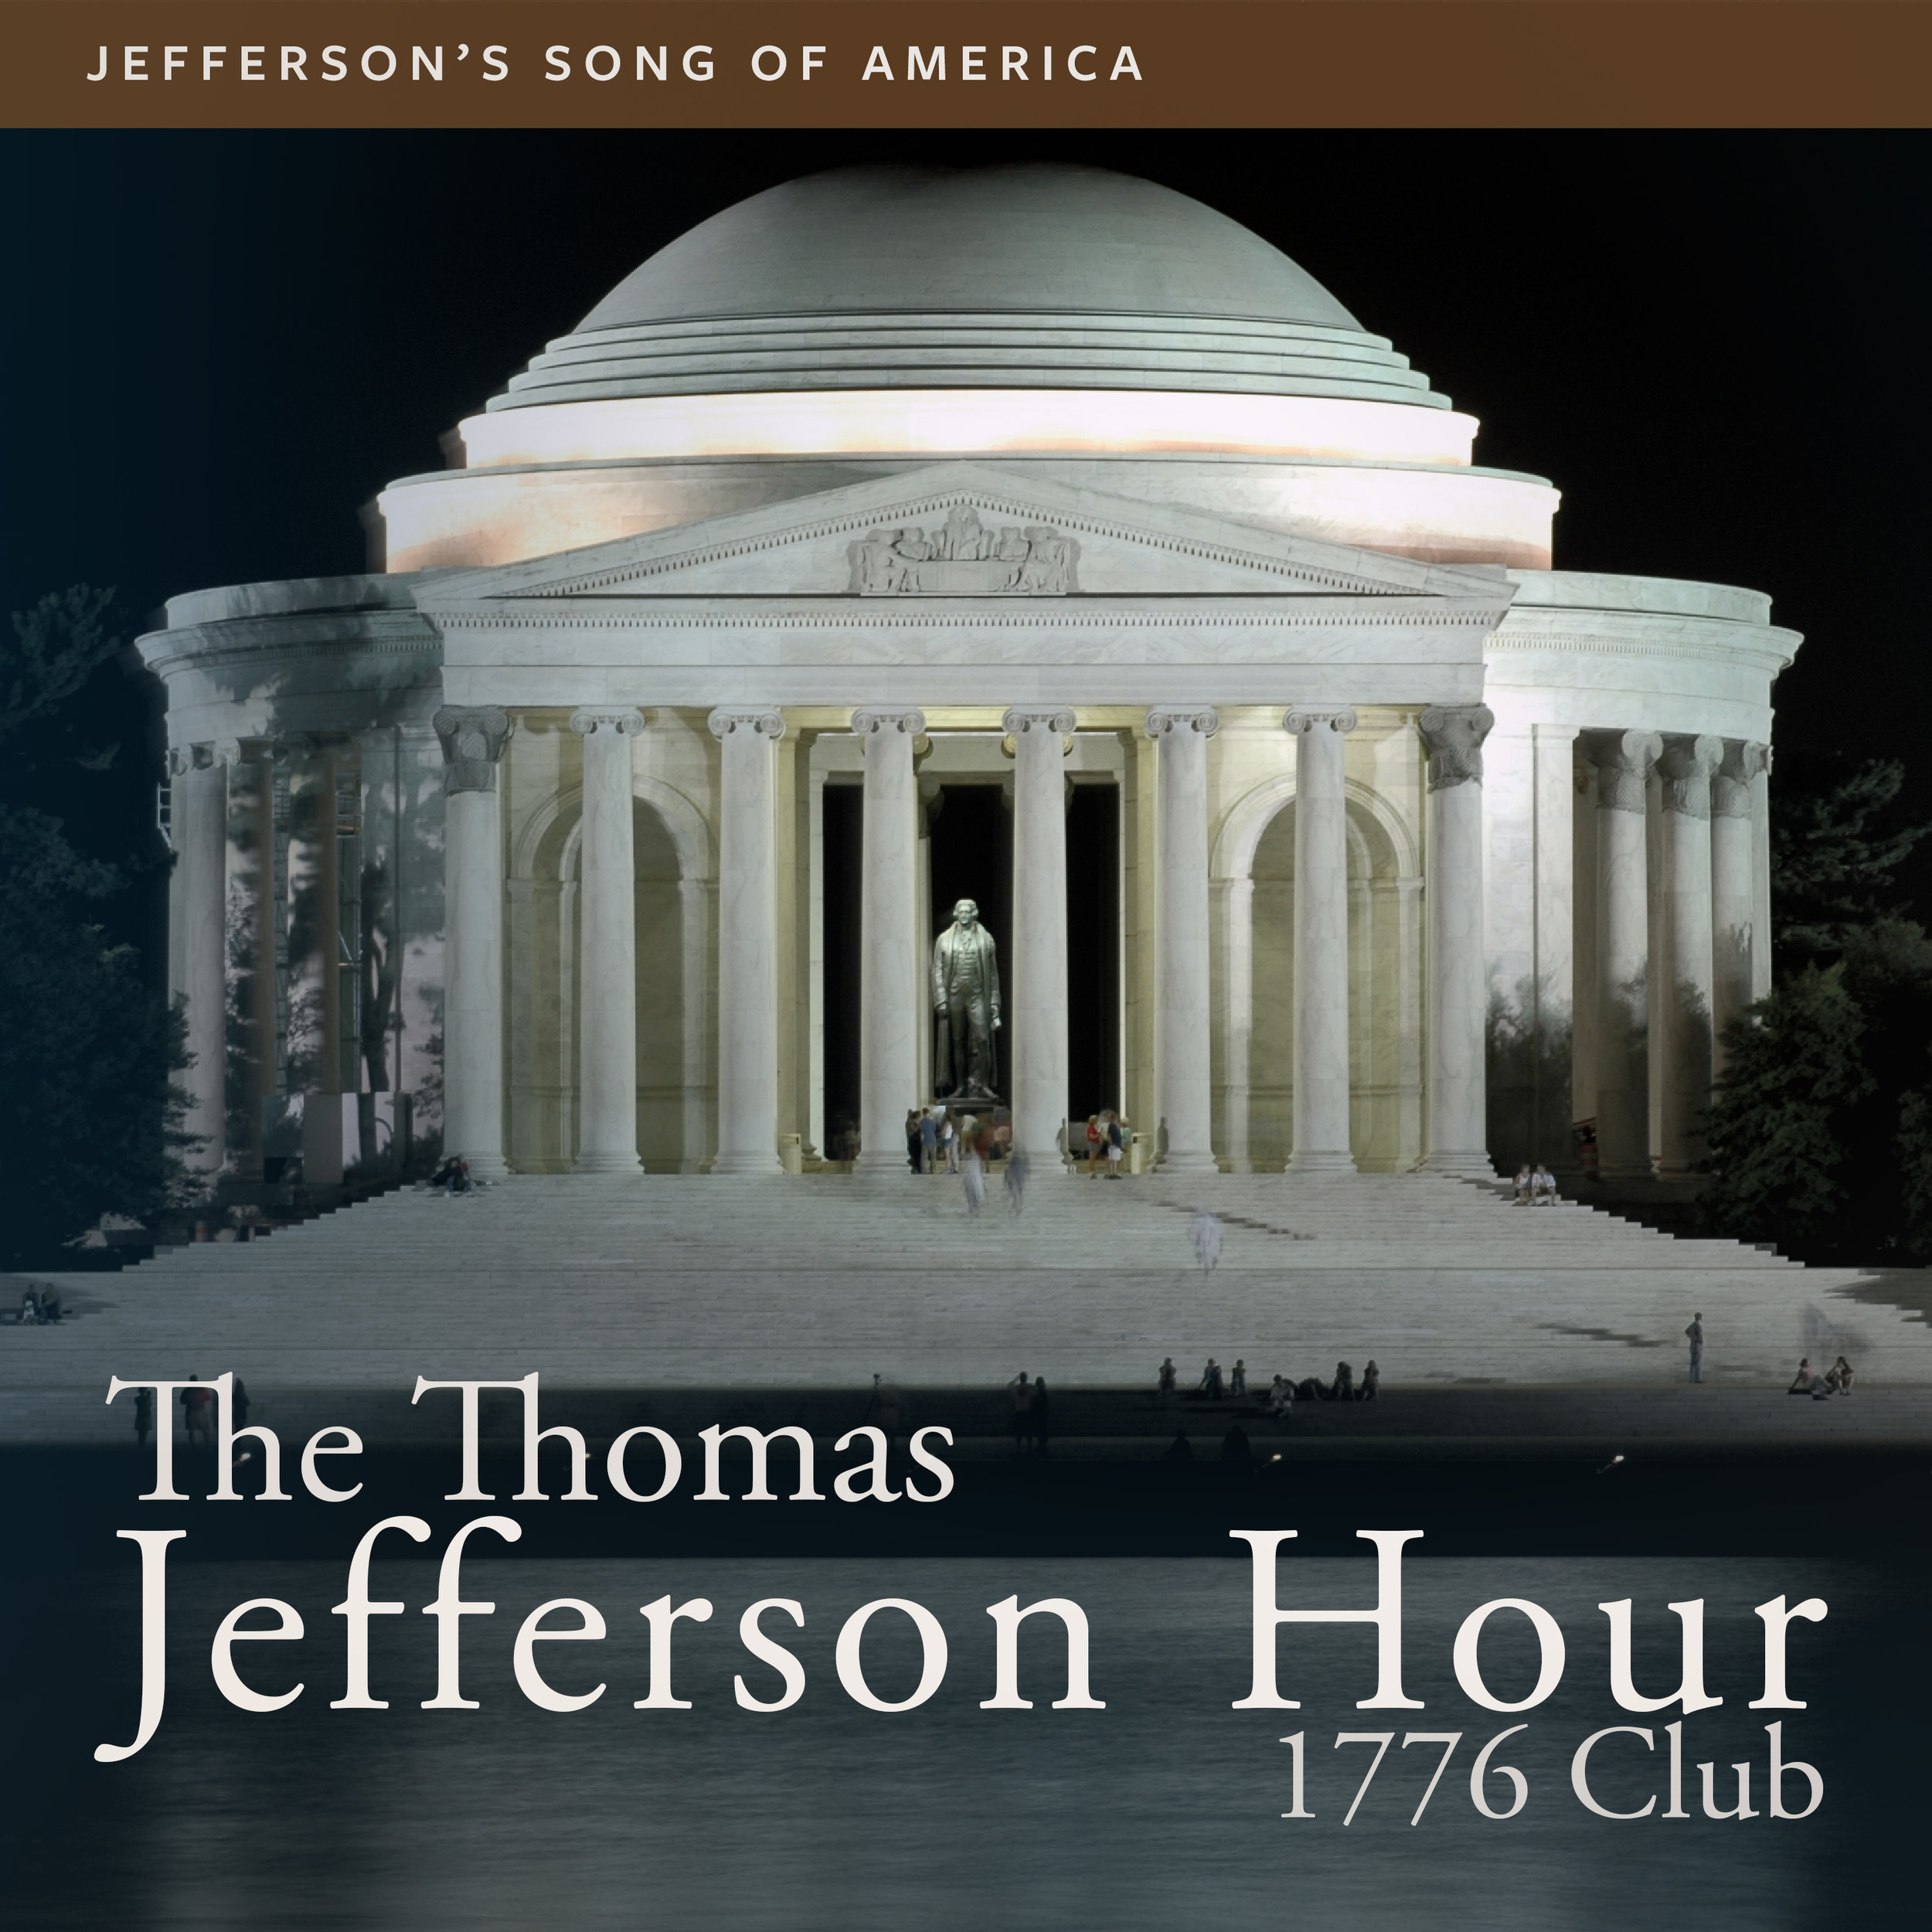 026 Jefferson's Song of America.jpg